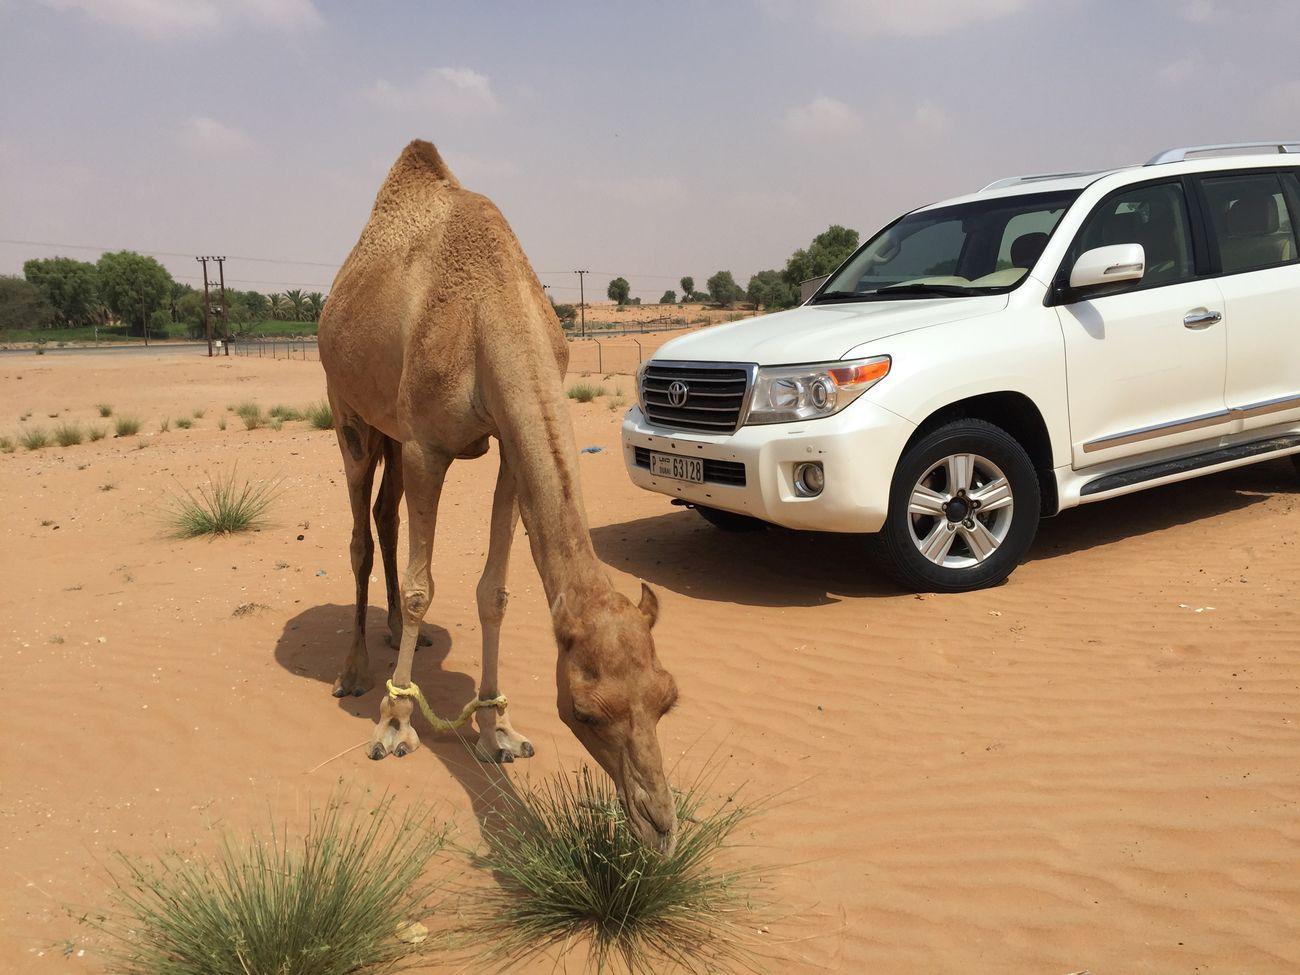 UAE VAE Dubai Dubai❤ Desert Camel Car White Car Whitecar Sand Camels Dubailife Desert Life Trip Beduines Animals Animal Sand Dune Holiday Animal And Car EyeEm Best Shots Nature Nature Photography One Animal Domestic Animals